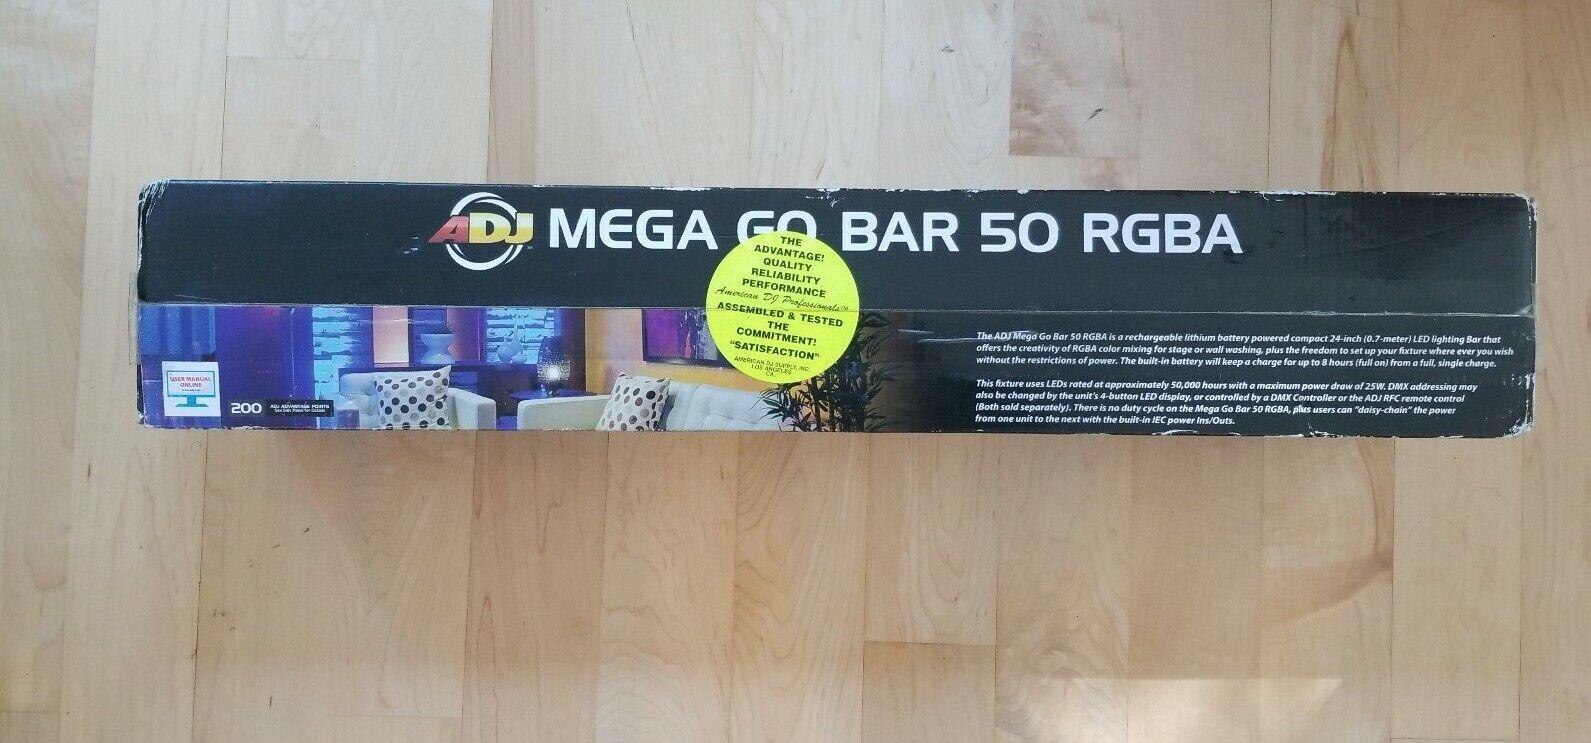 ADJ Mega Stage Light Bar 50 RGB LED Wall Wash Lights Lithium Ion